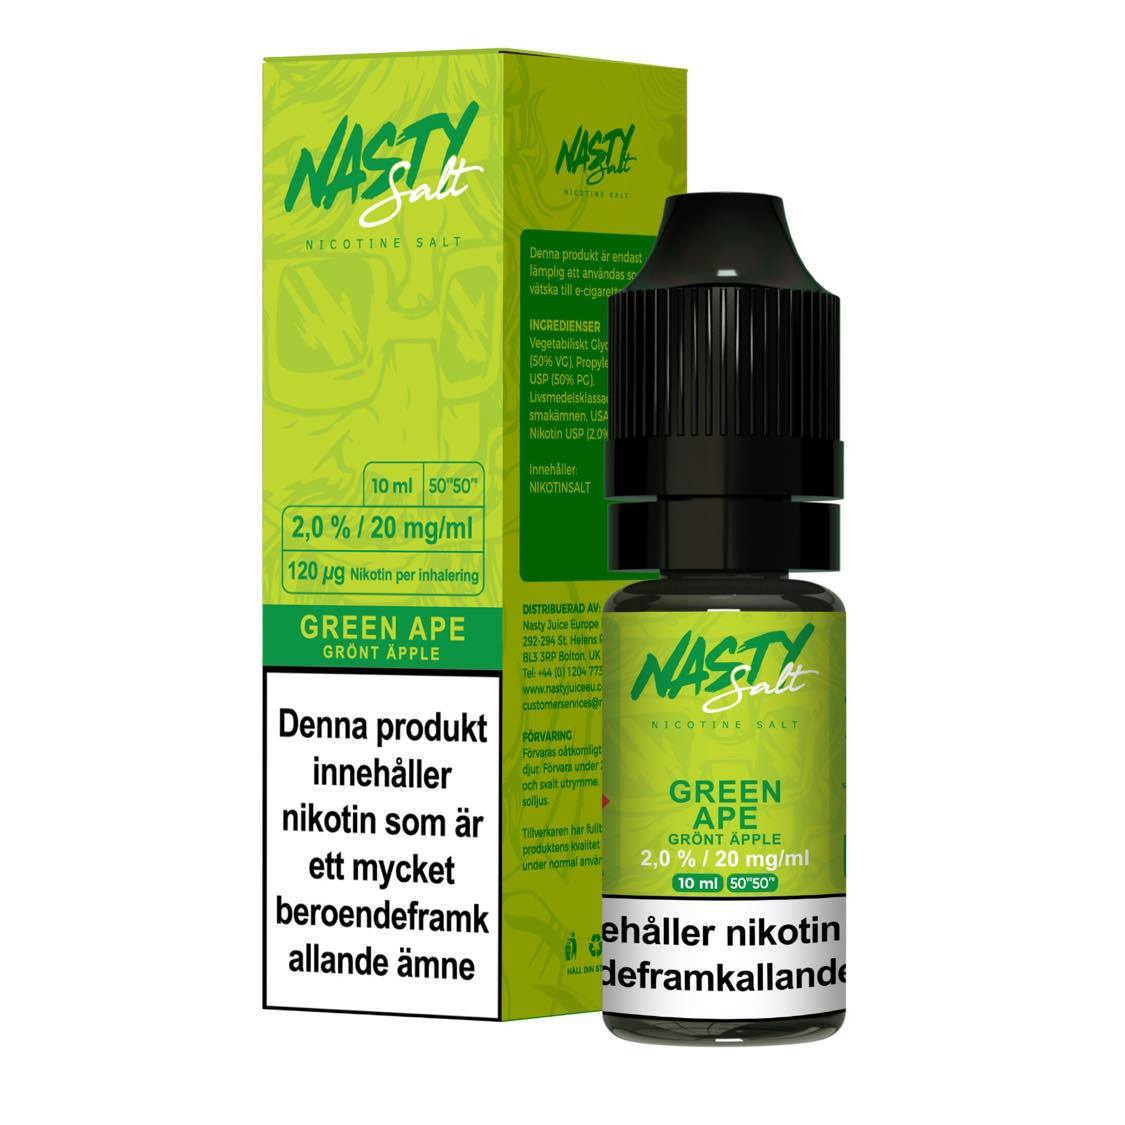 Nasty Juice - Green Ape (10ml, 20mg nikotinsalt)